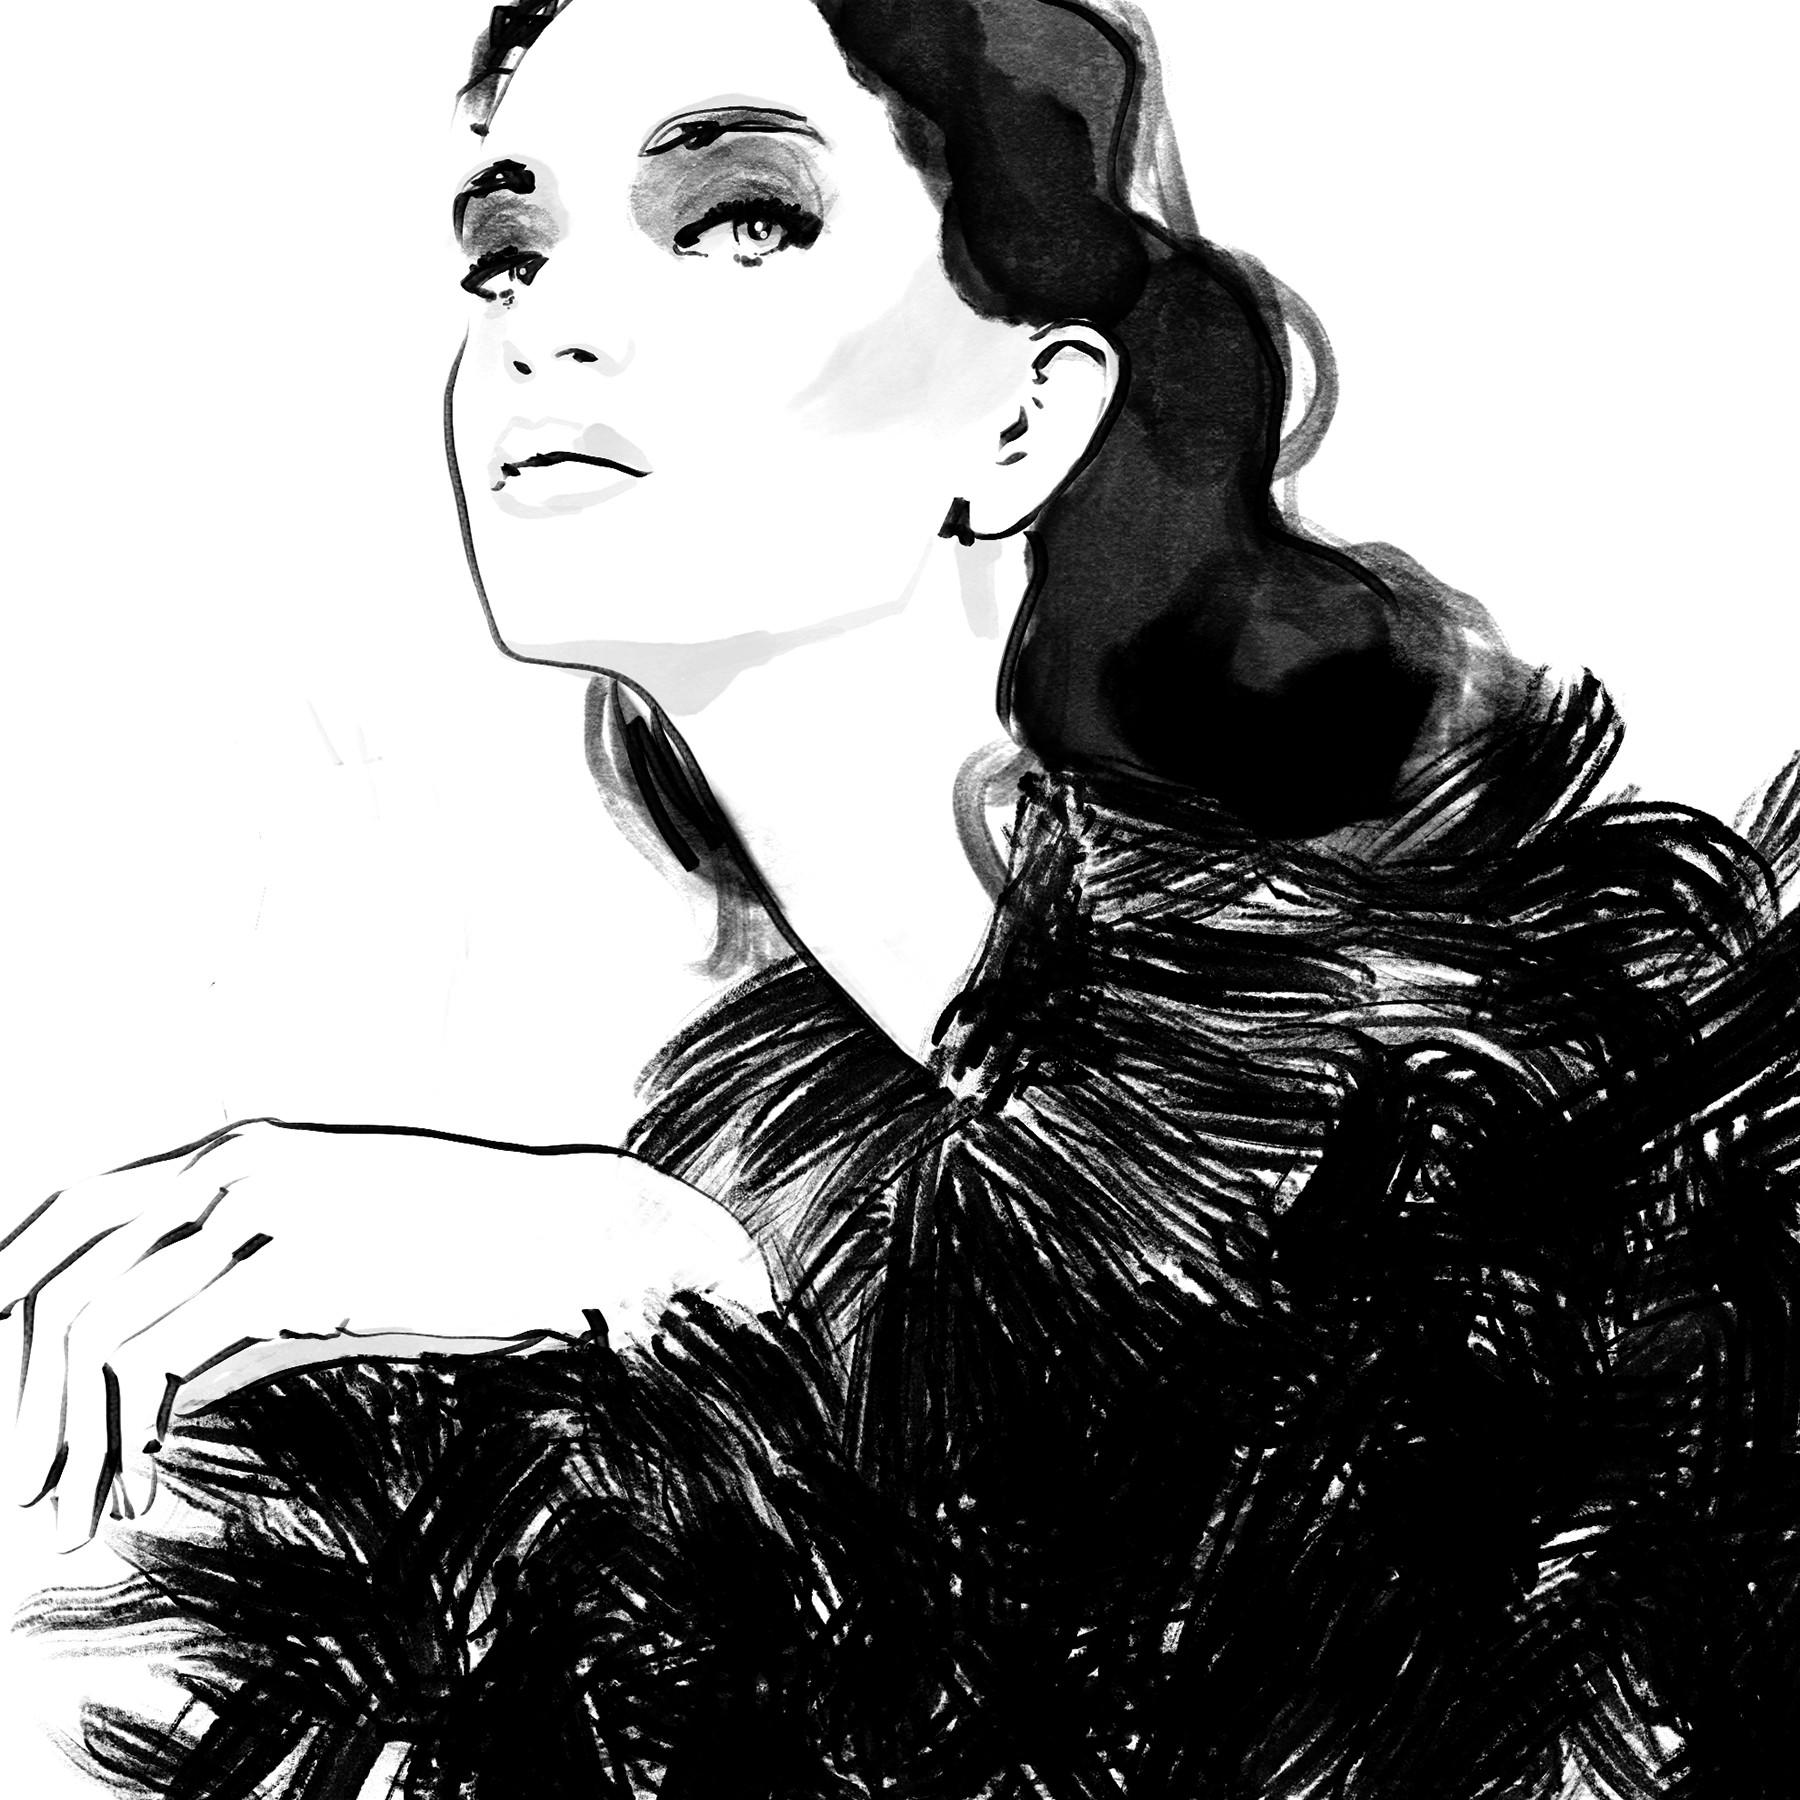 Inktober ink Fashion Illustrations 2017 day 11